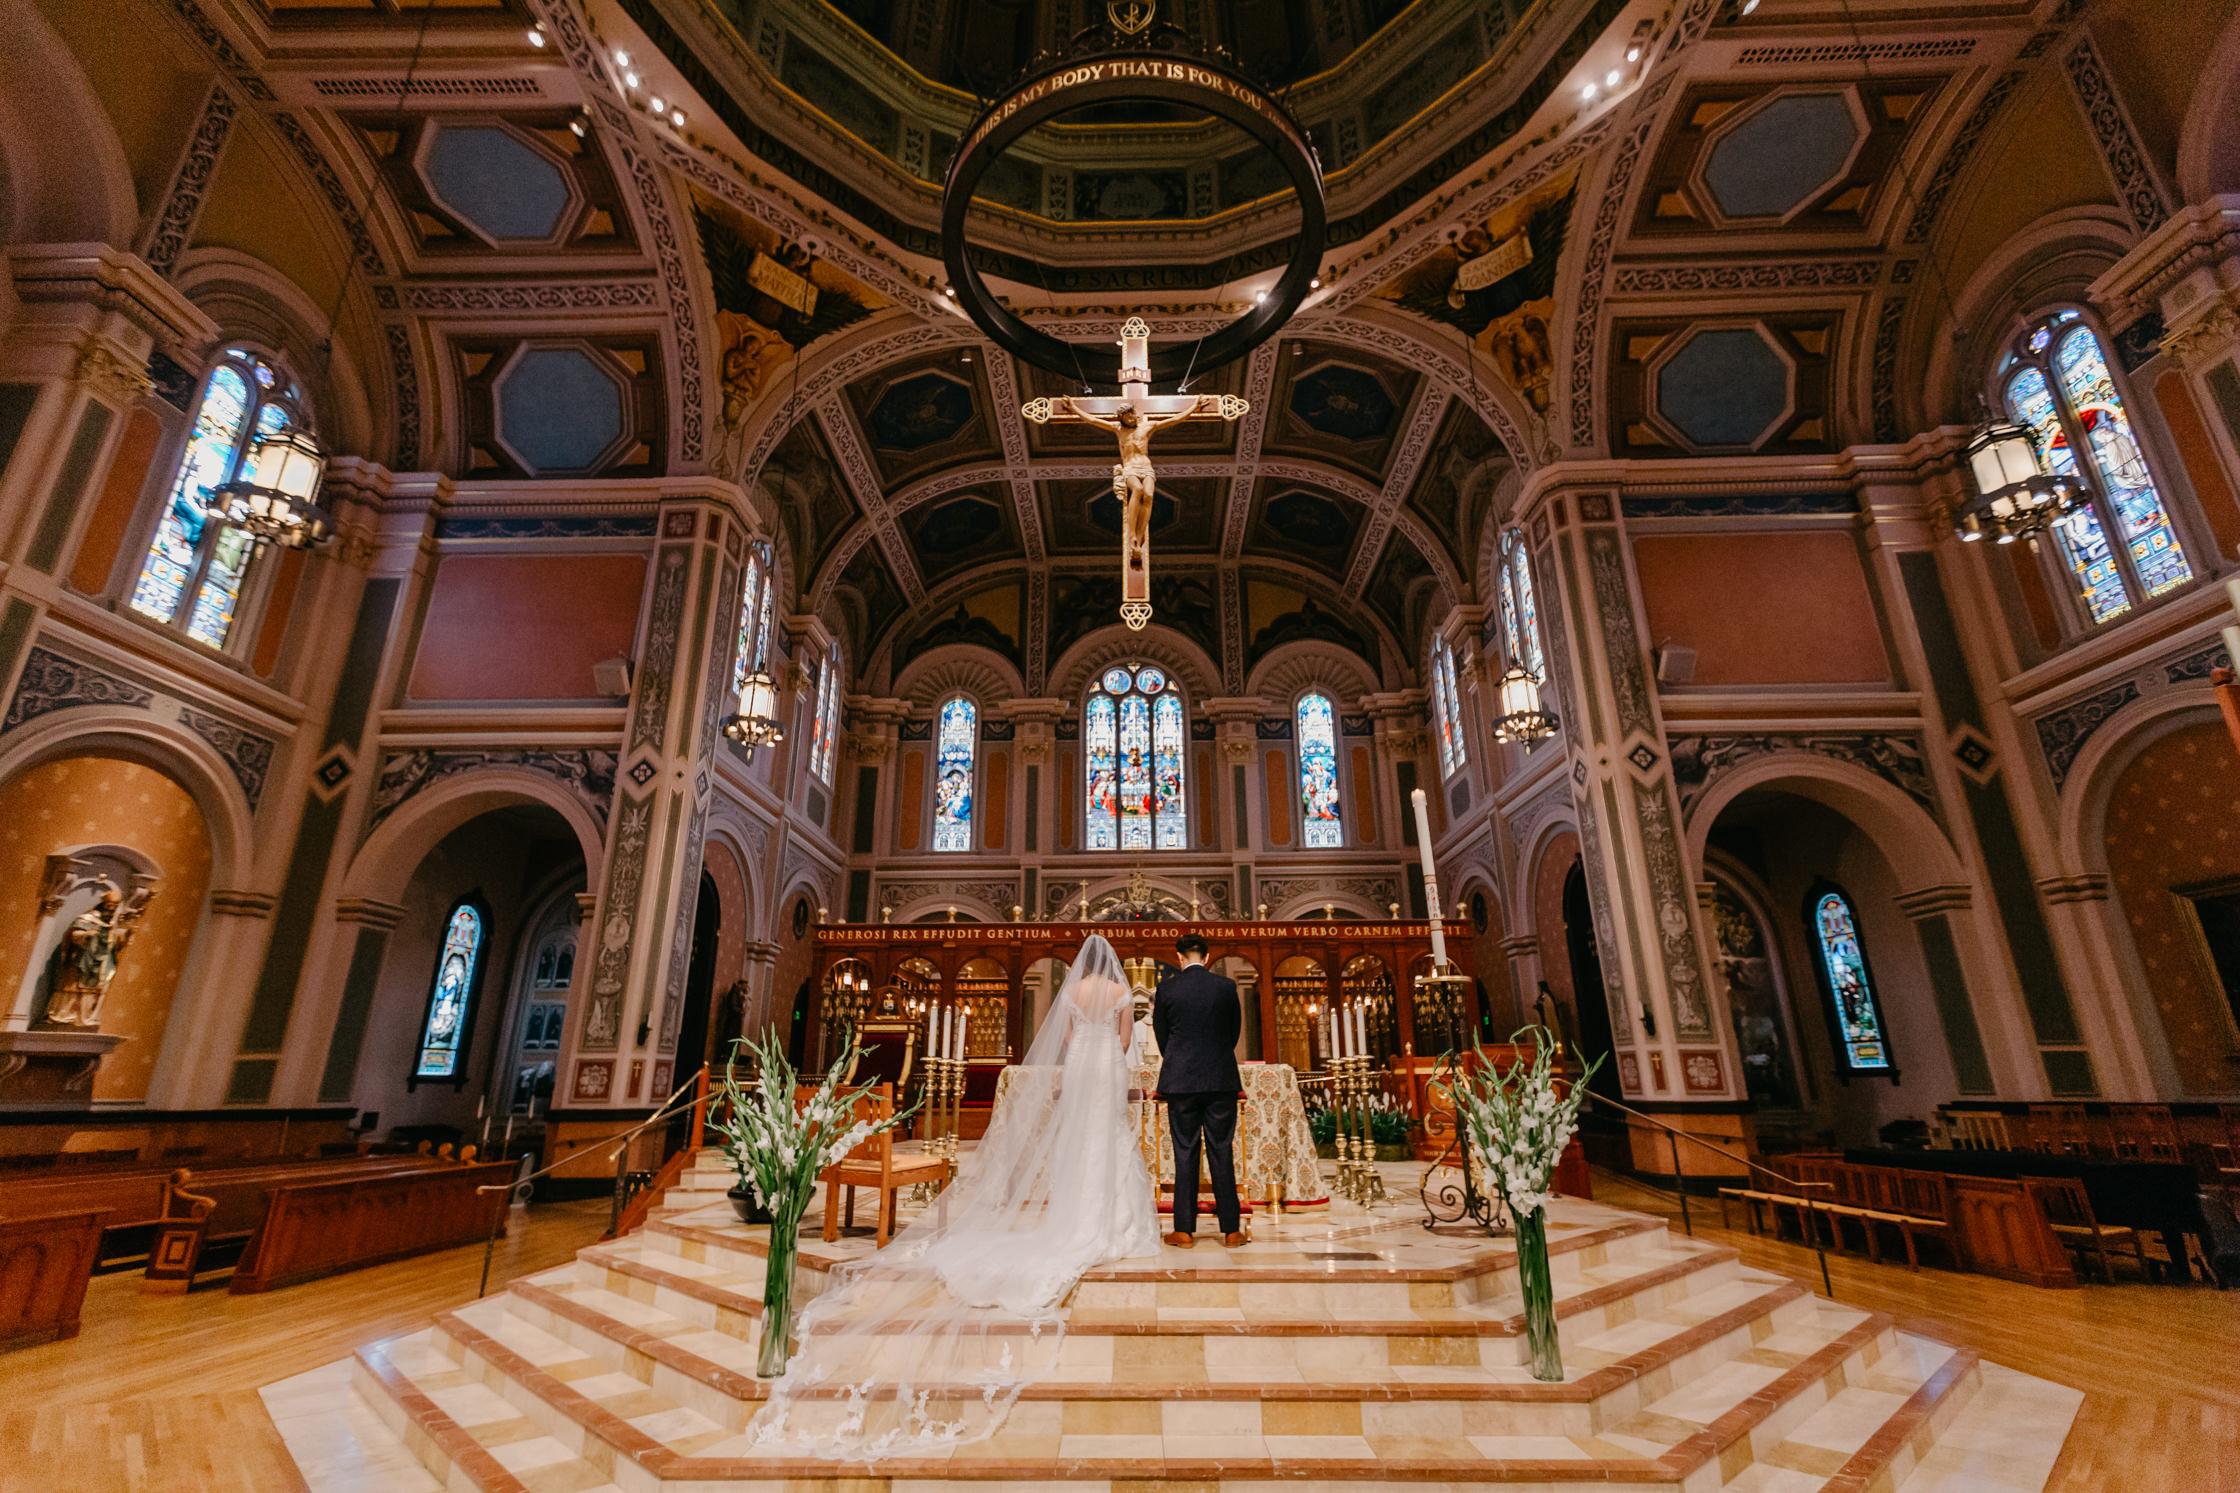 luis_joanna_wedding-36.jpg